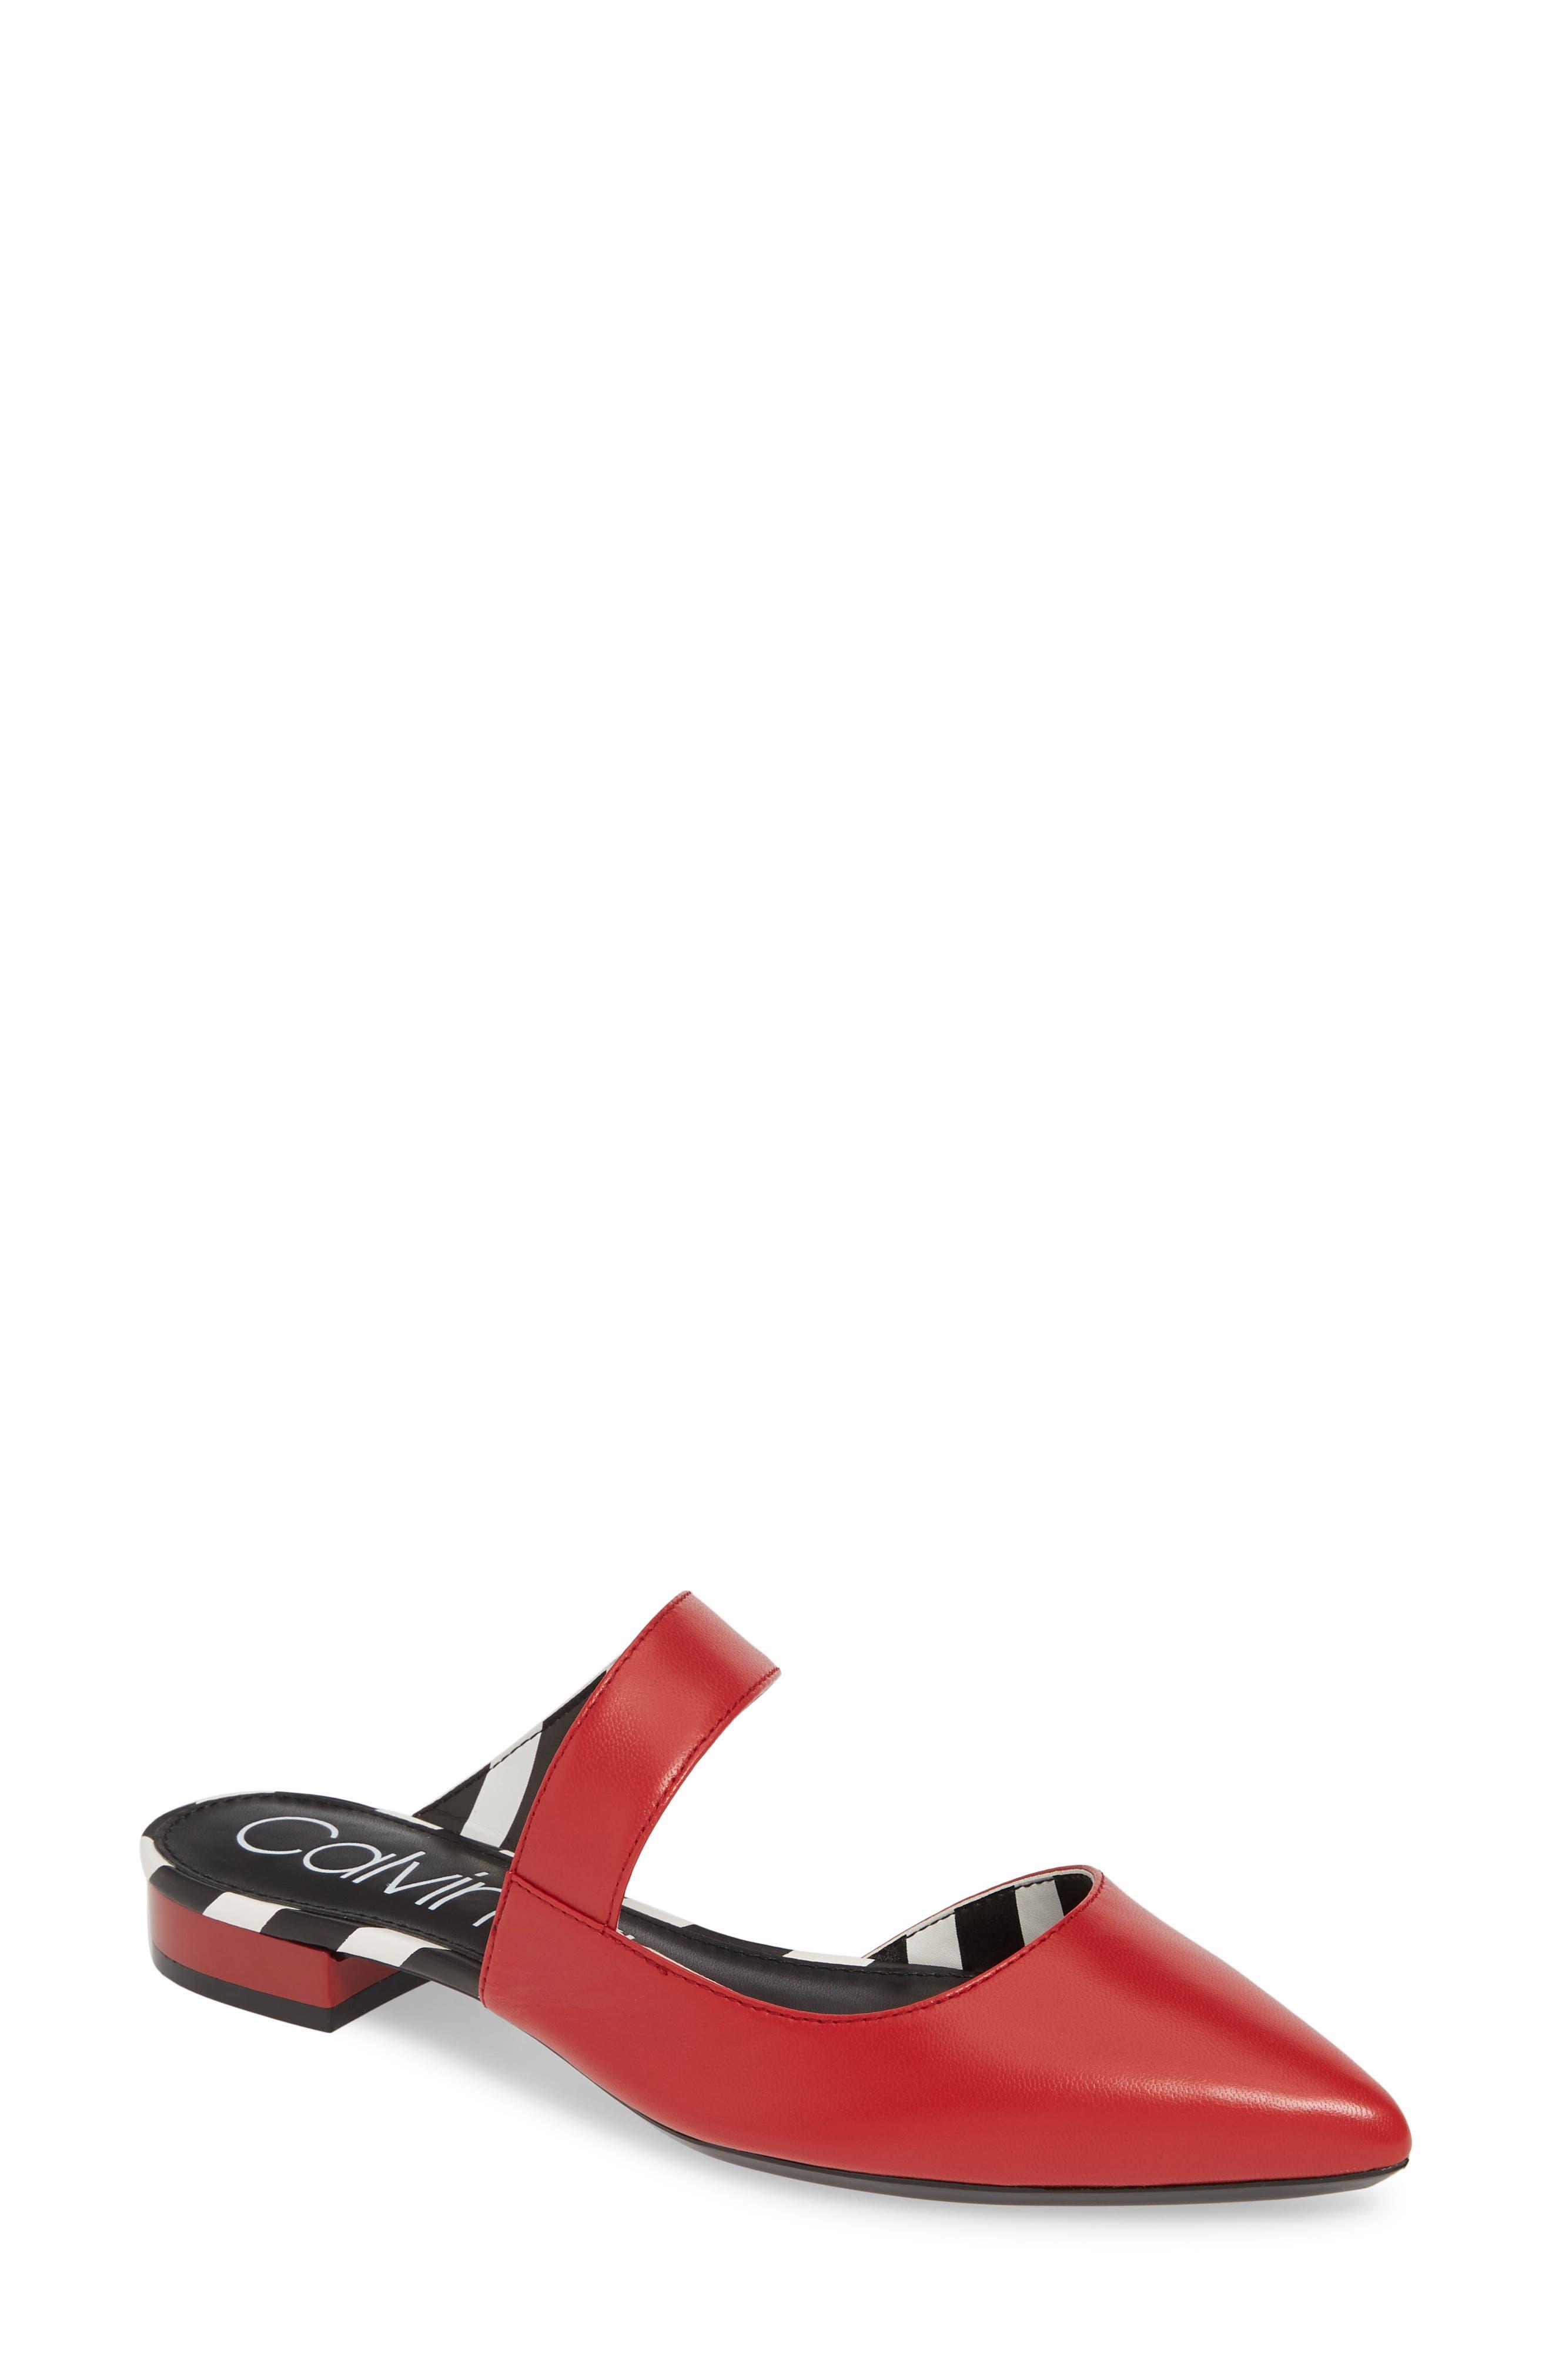 Calvin Klein Arleys Asymmetrical Pointy Toe Mule- Red